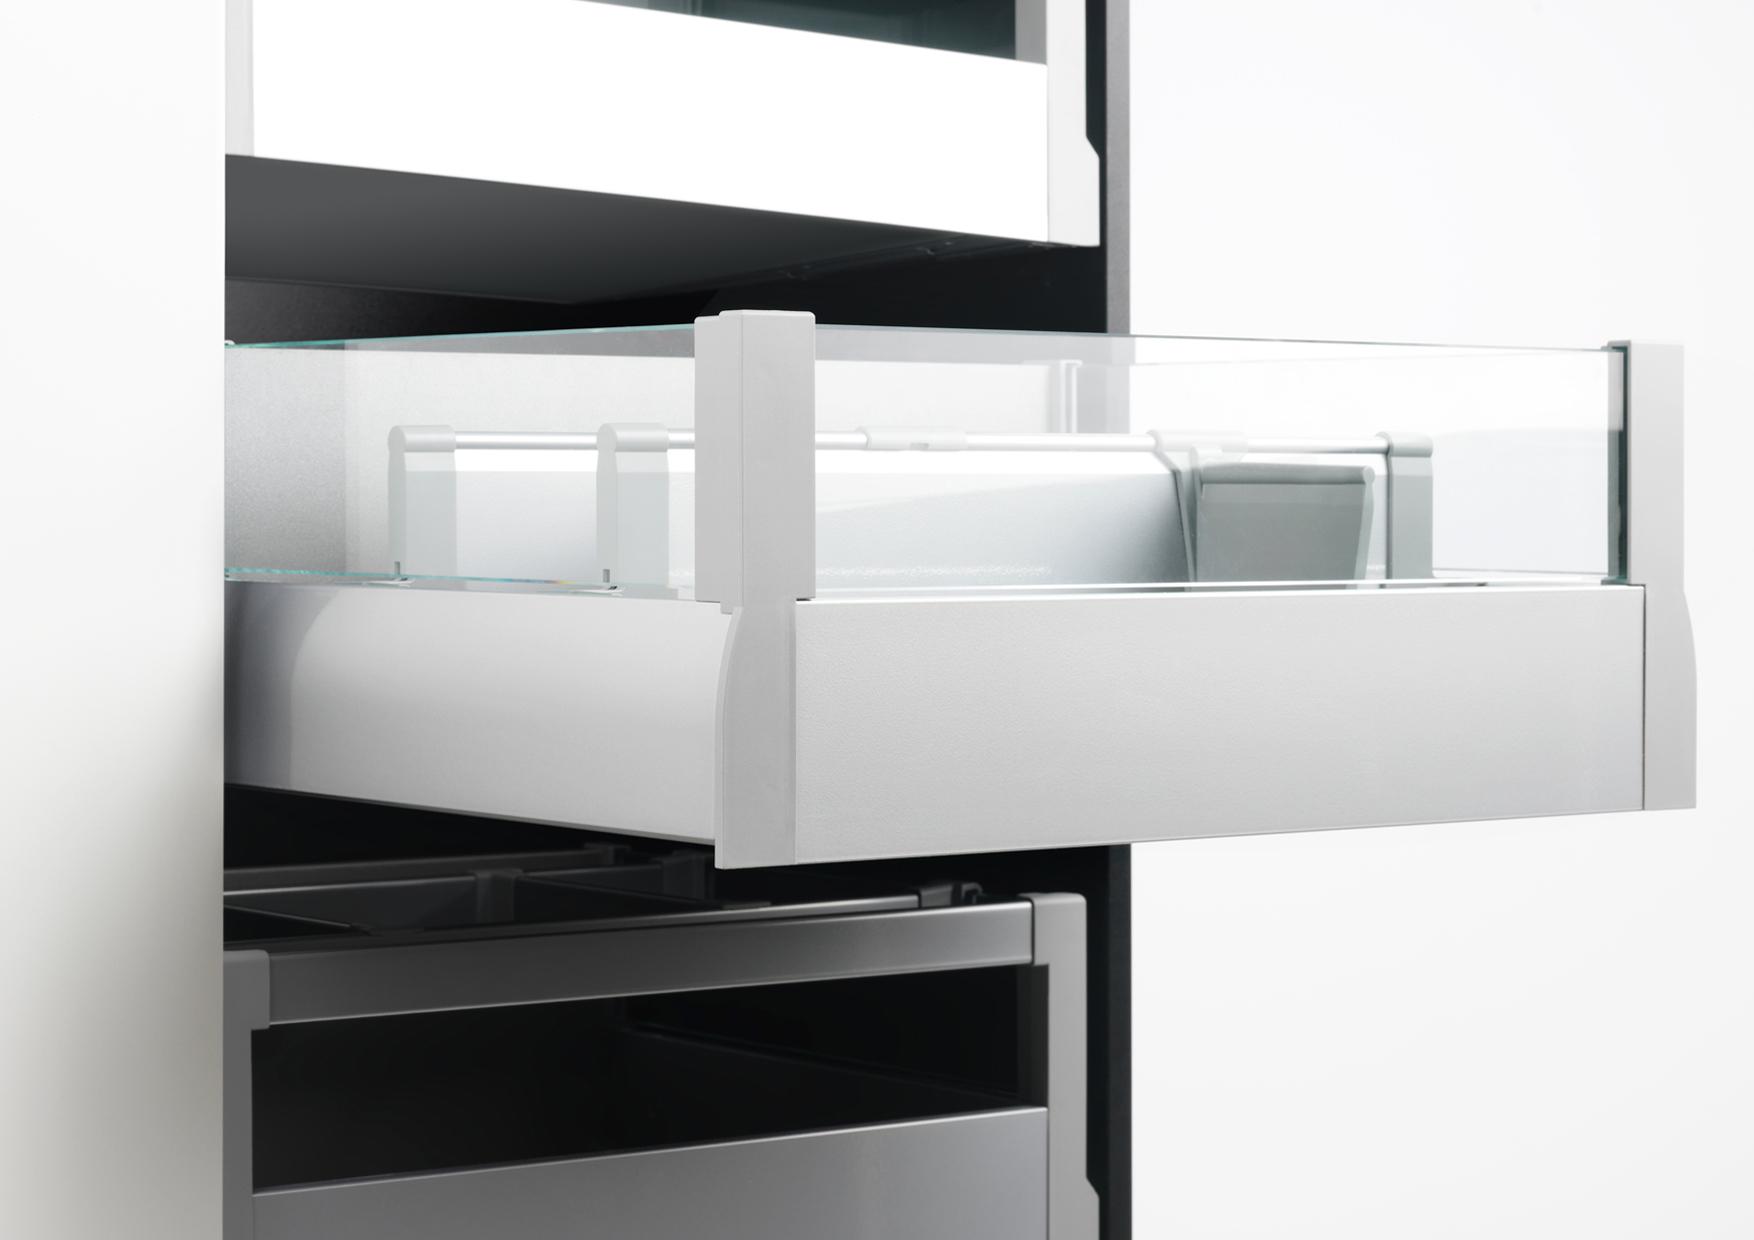 Frontauszug Küche | Intelligent Storage Solutions Offer More Comfort In The Kitchen